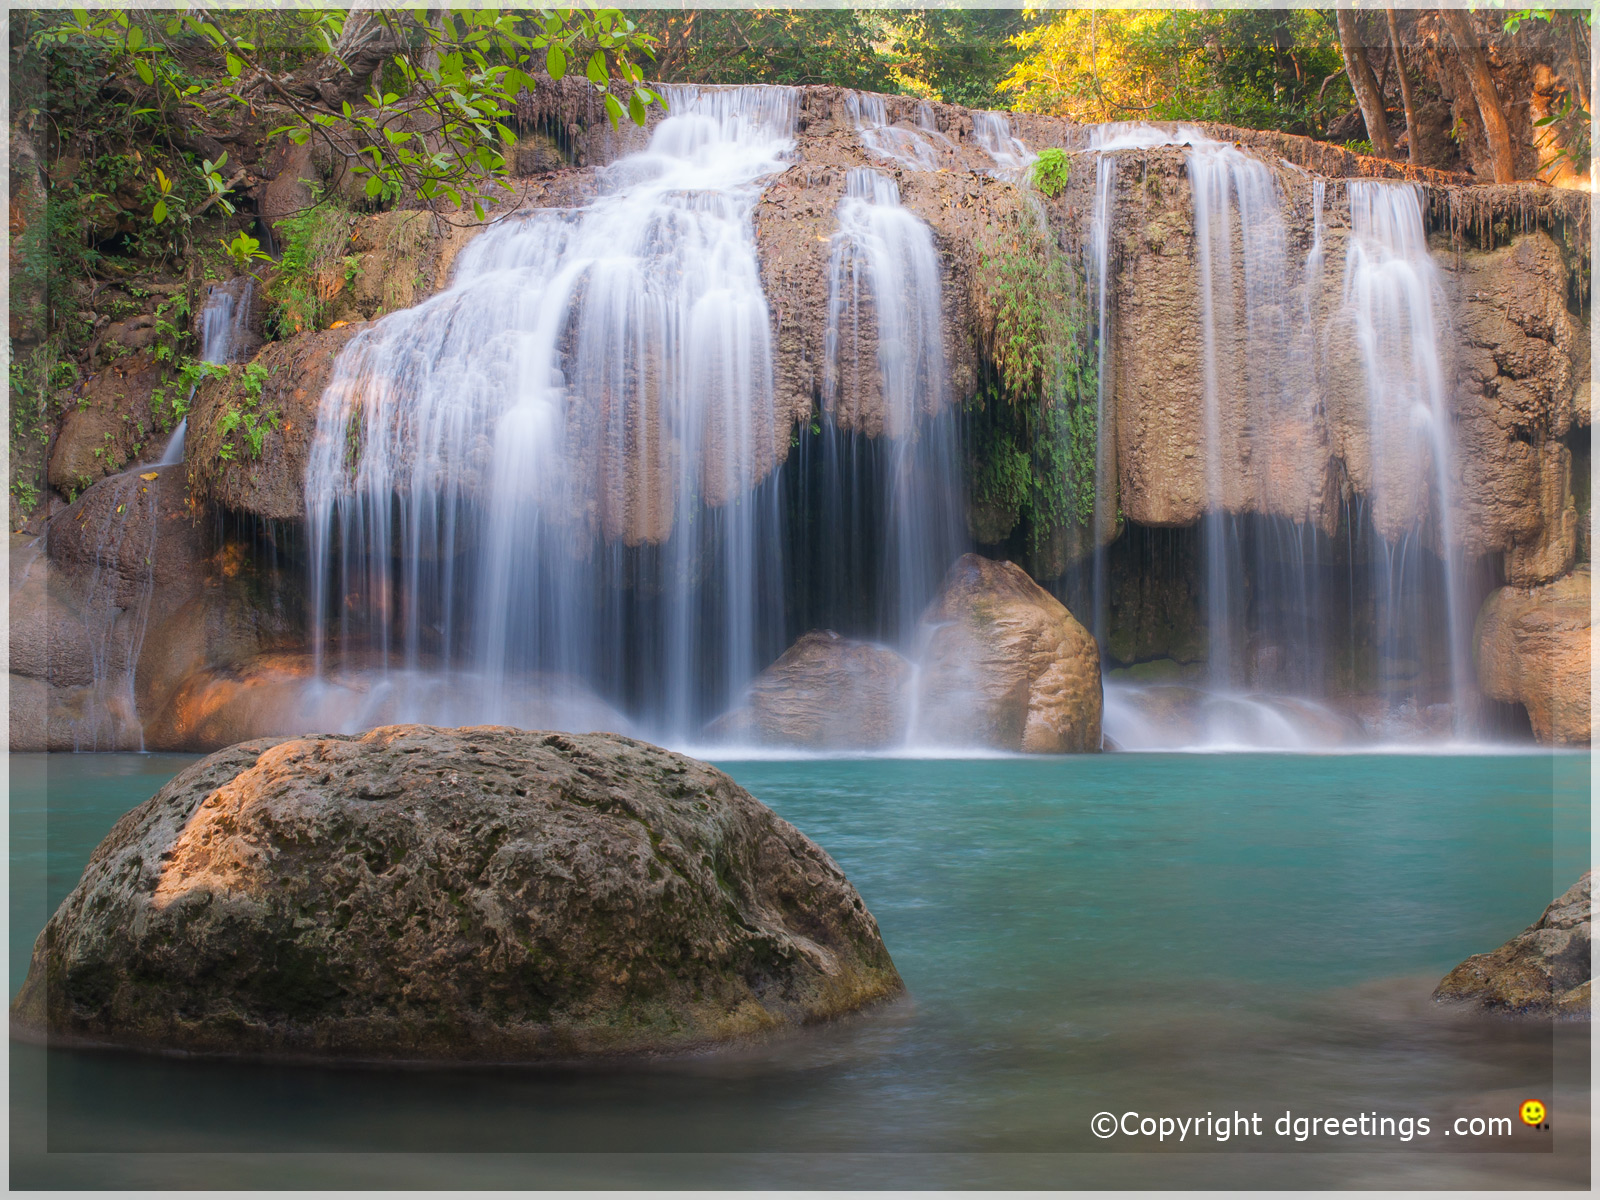 Waterfall Wallpapers Waterfall Wallpapers Animated Waterfall 1600x1200